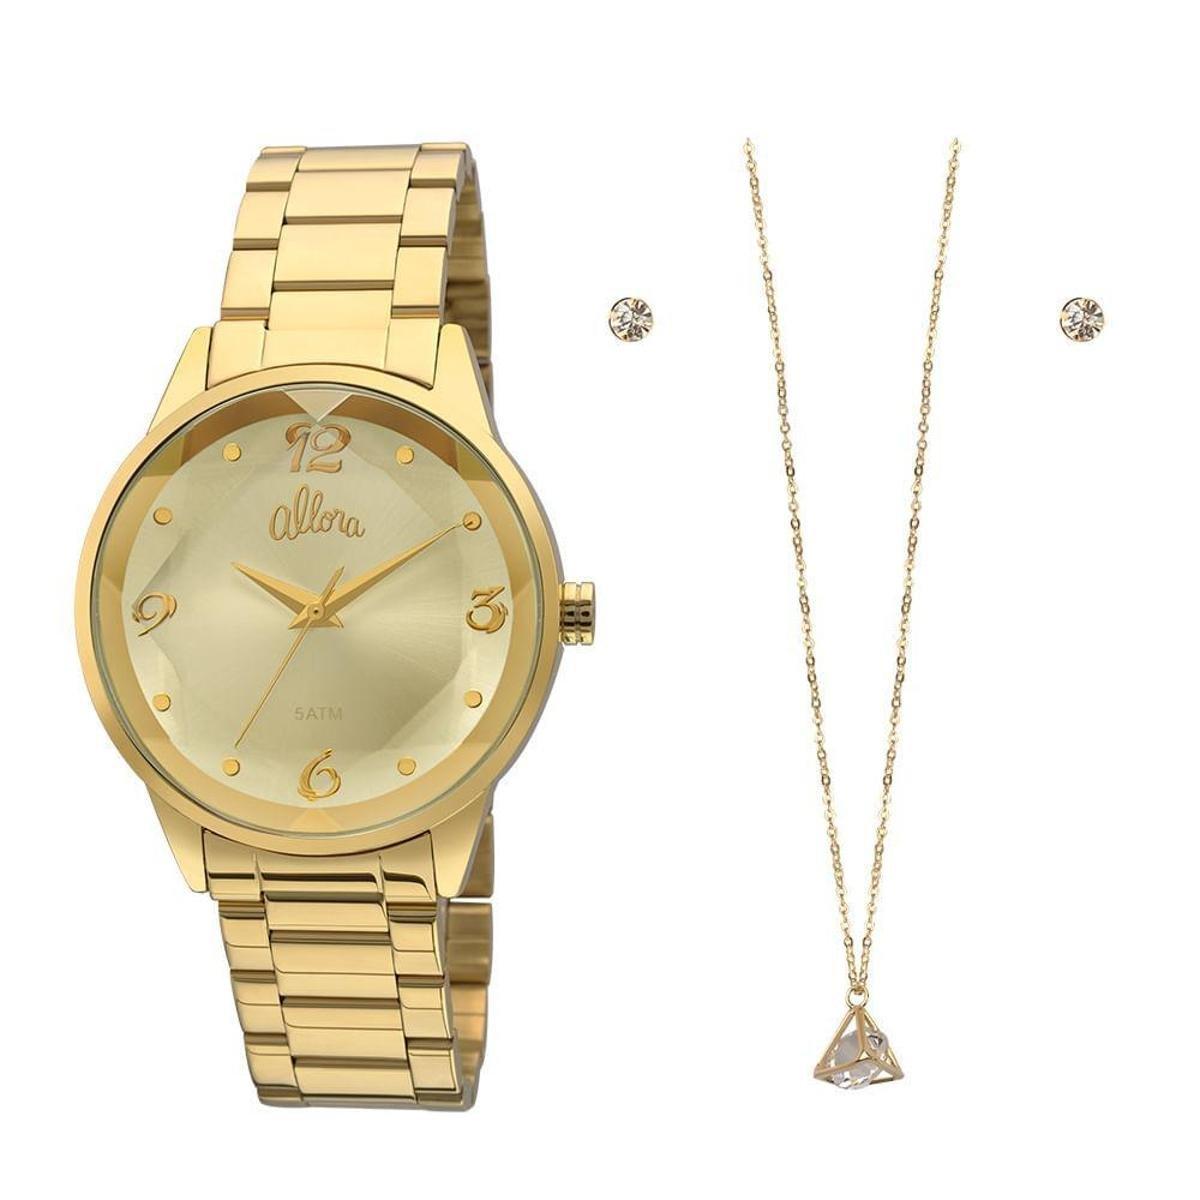 59d9a40275248 Relógio Allora Feminino AL2035FKO K4X - Dourado AL2035FKO K4X - Compre  Agora